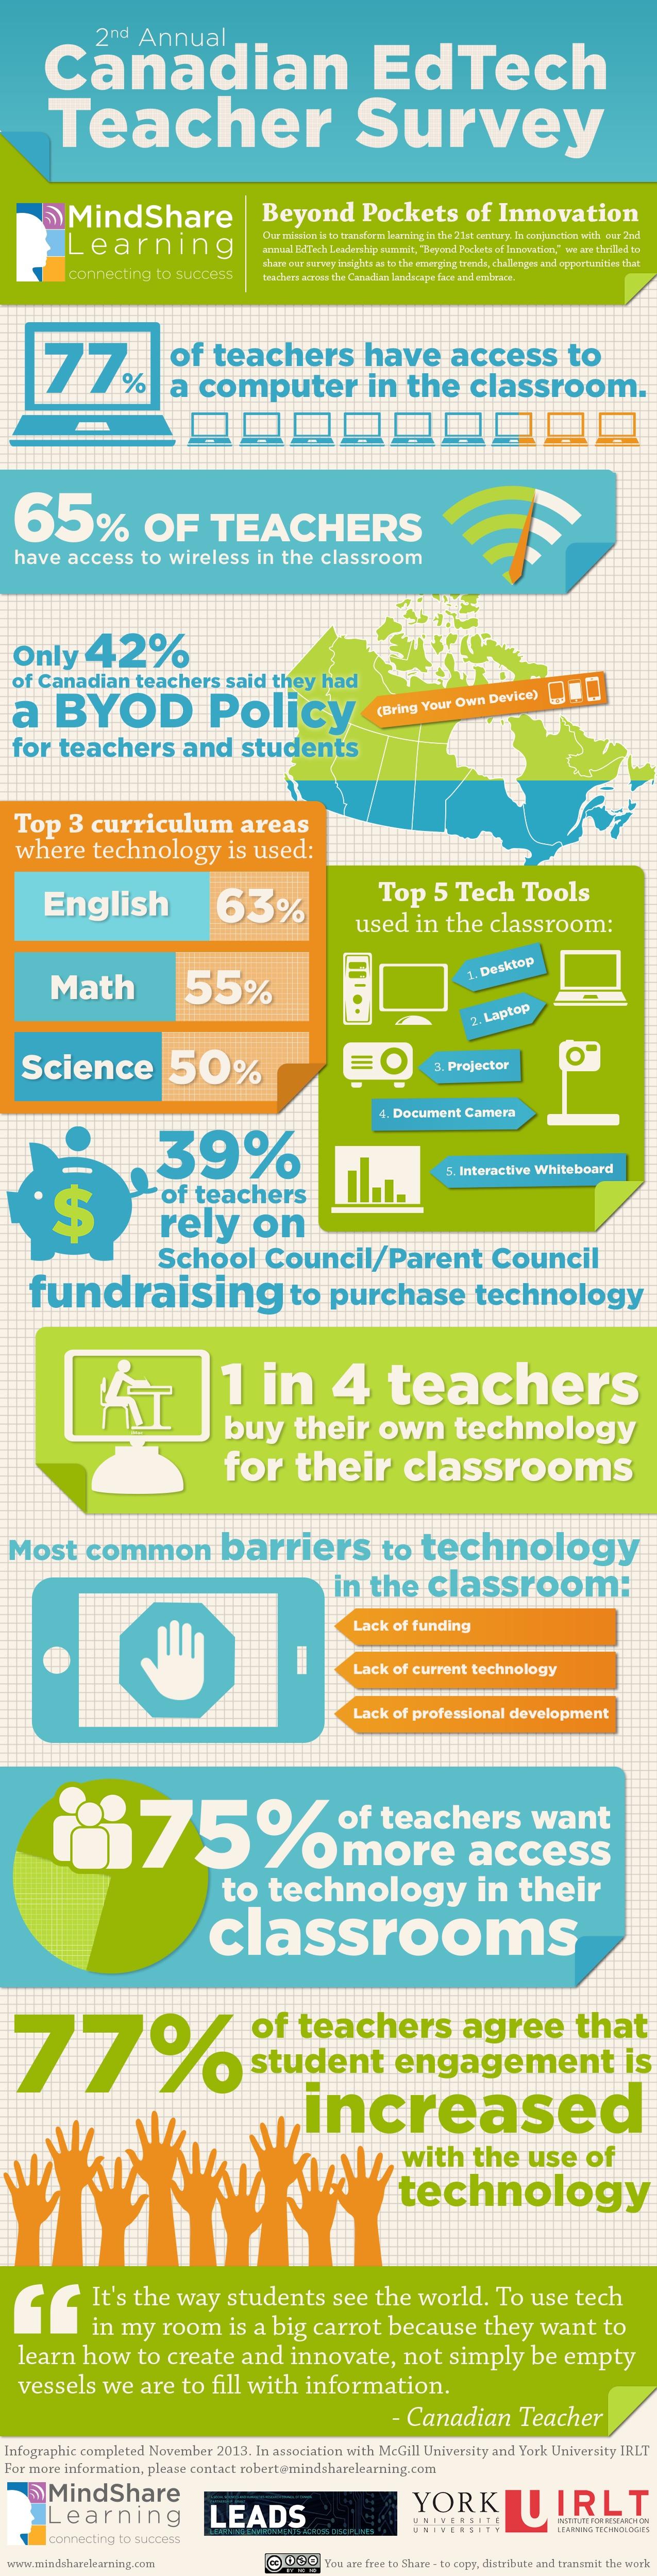 Canadian EdTech Teacher Survey Infographic